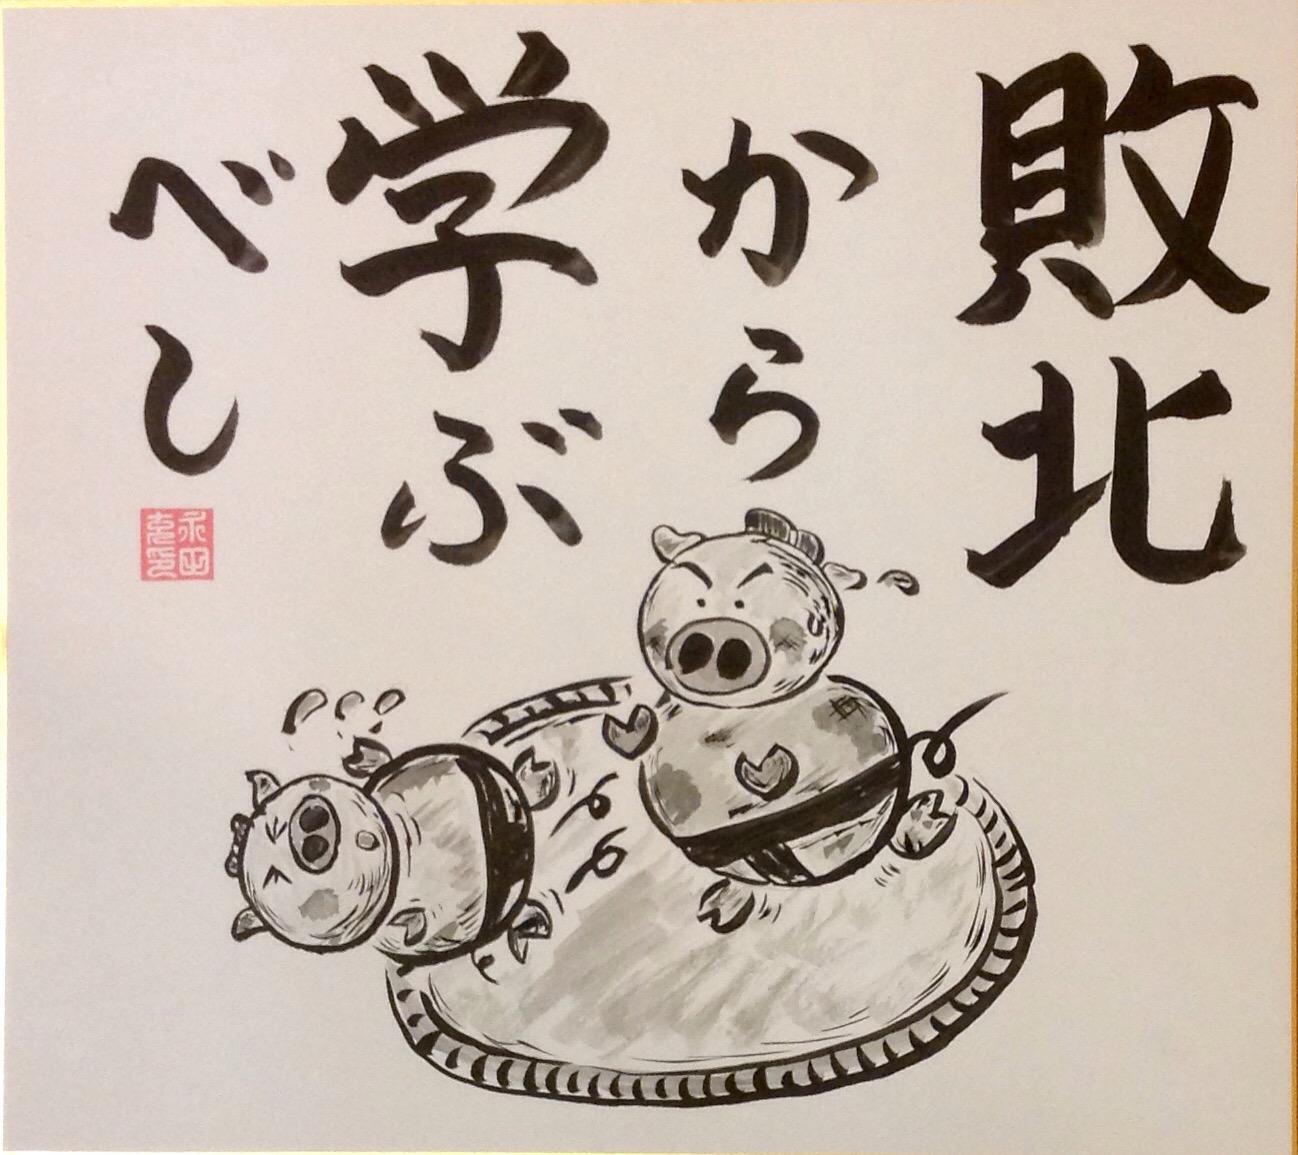 Nagataya kyoto japanese calligraphy shodō by mitsuru nagata